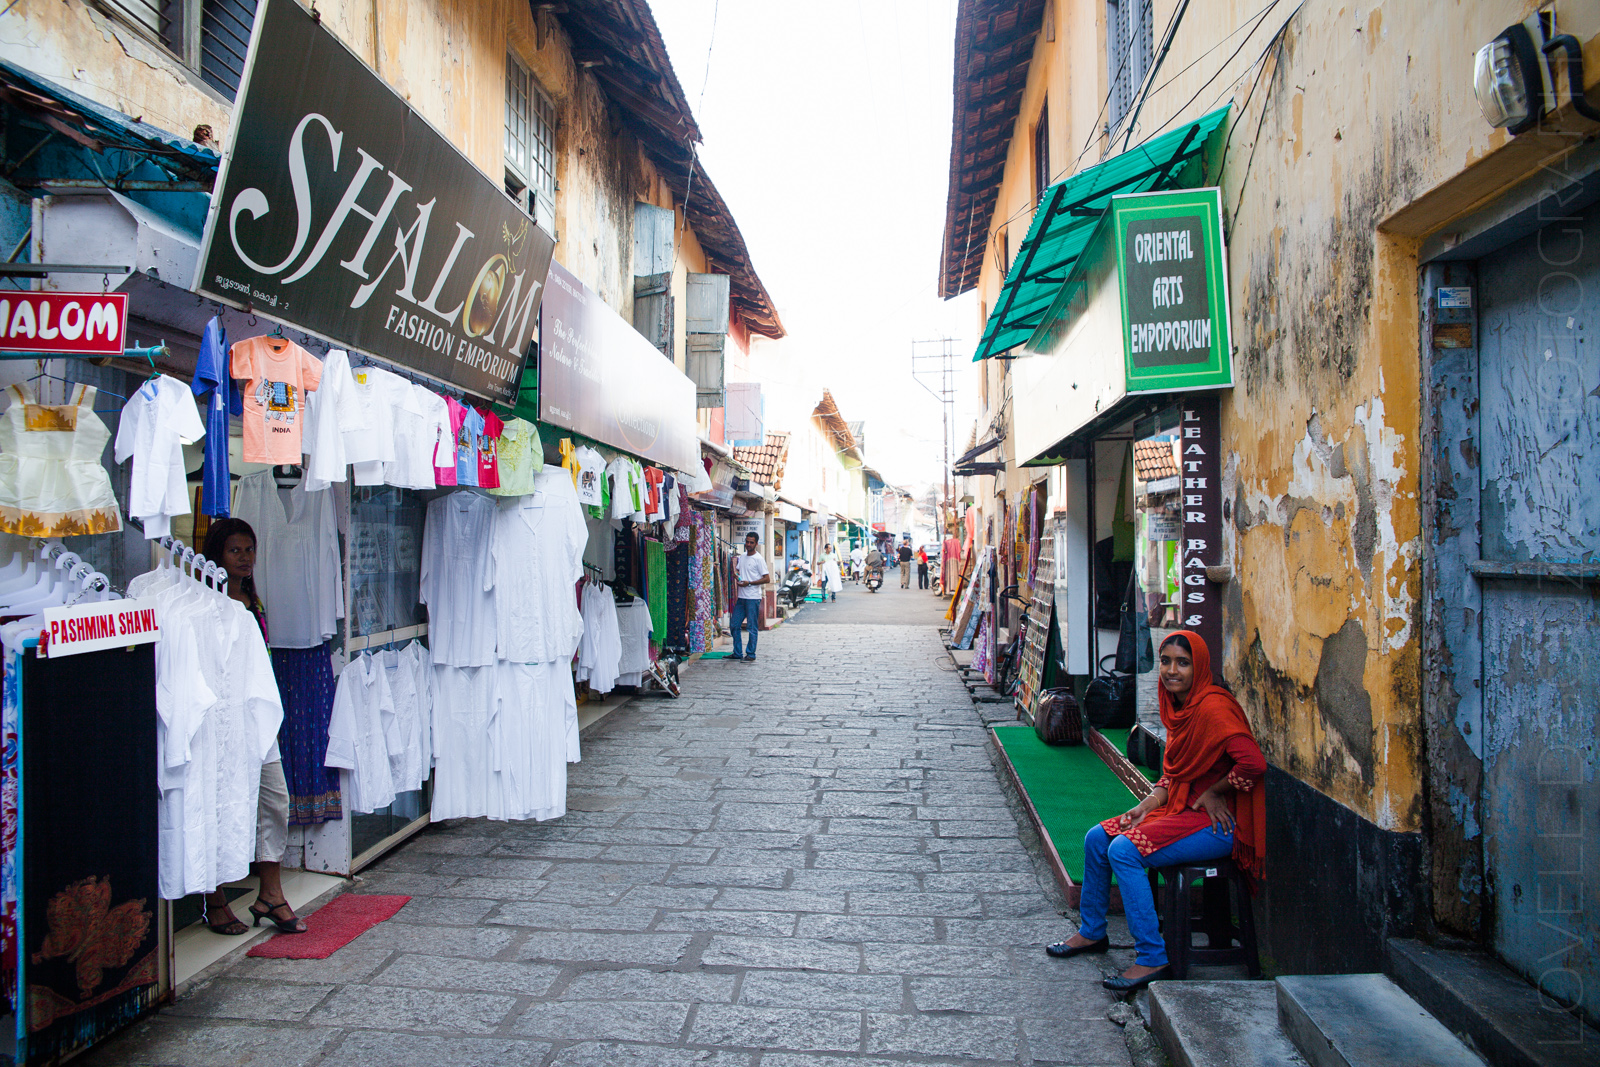 Curio shops at the Synagogue lane